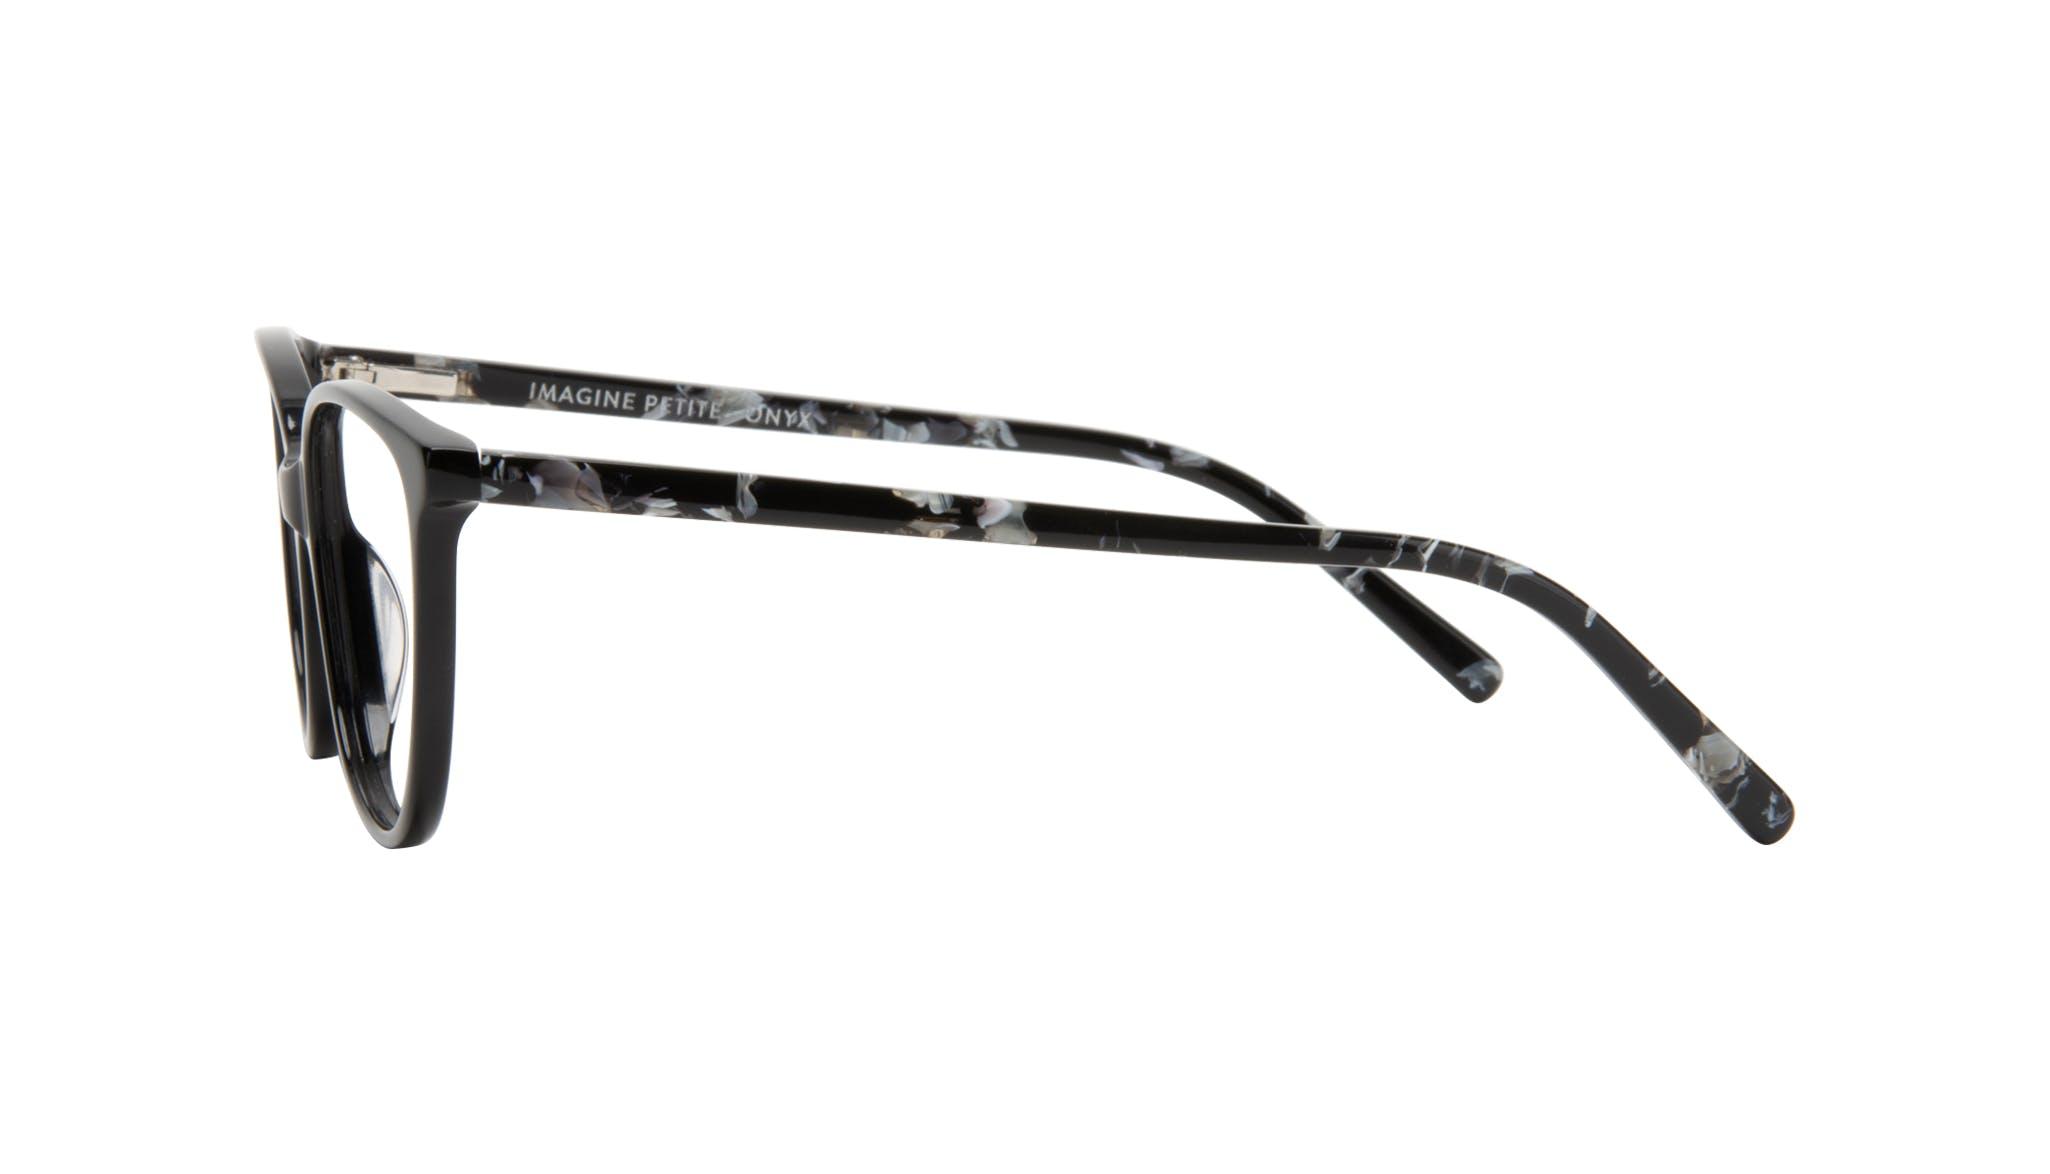 Affordable Fashion Glasses Round Eyeglasses Women Imagine Petite Onyx Side